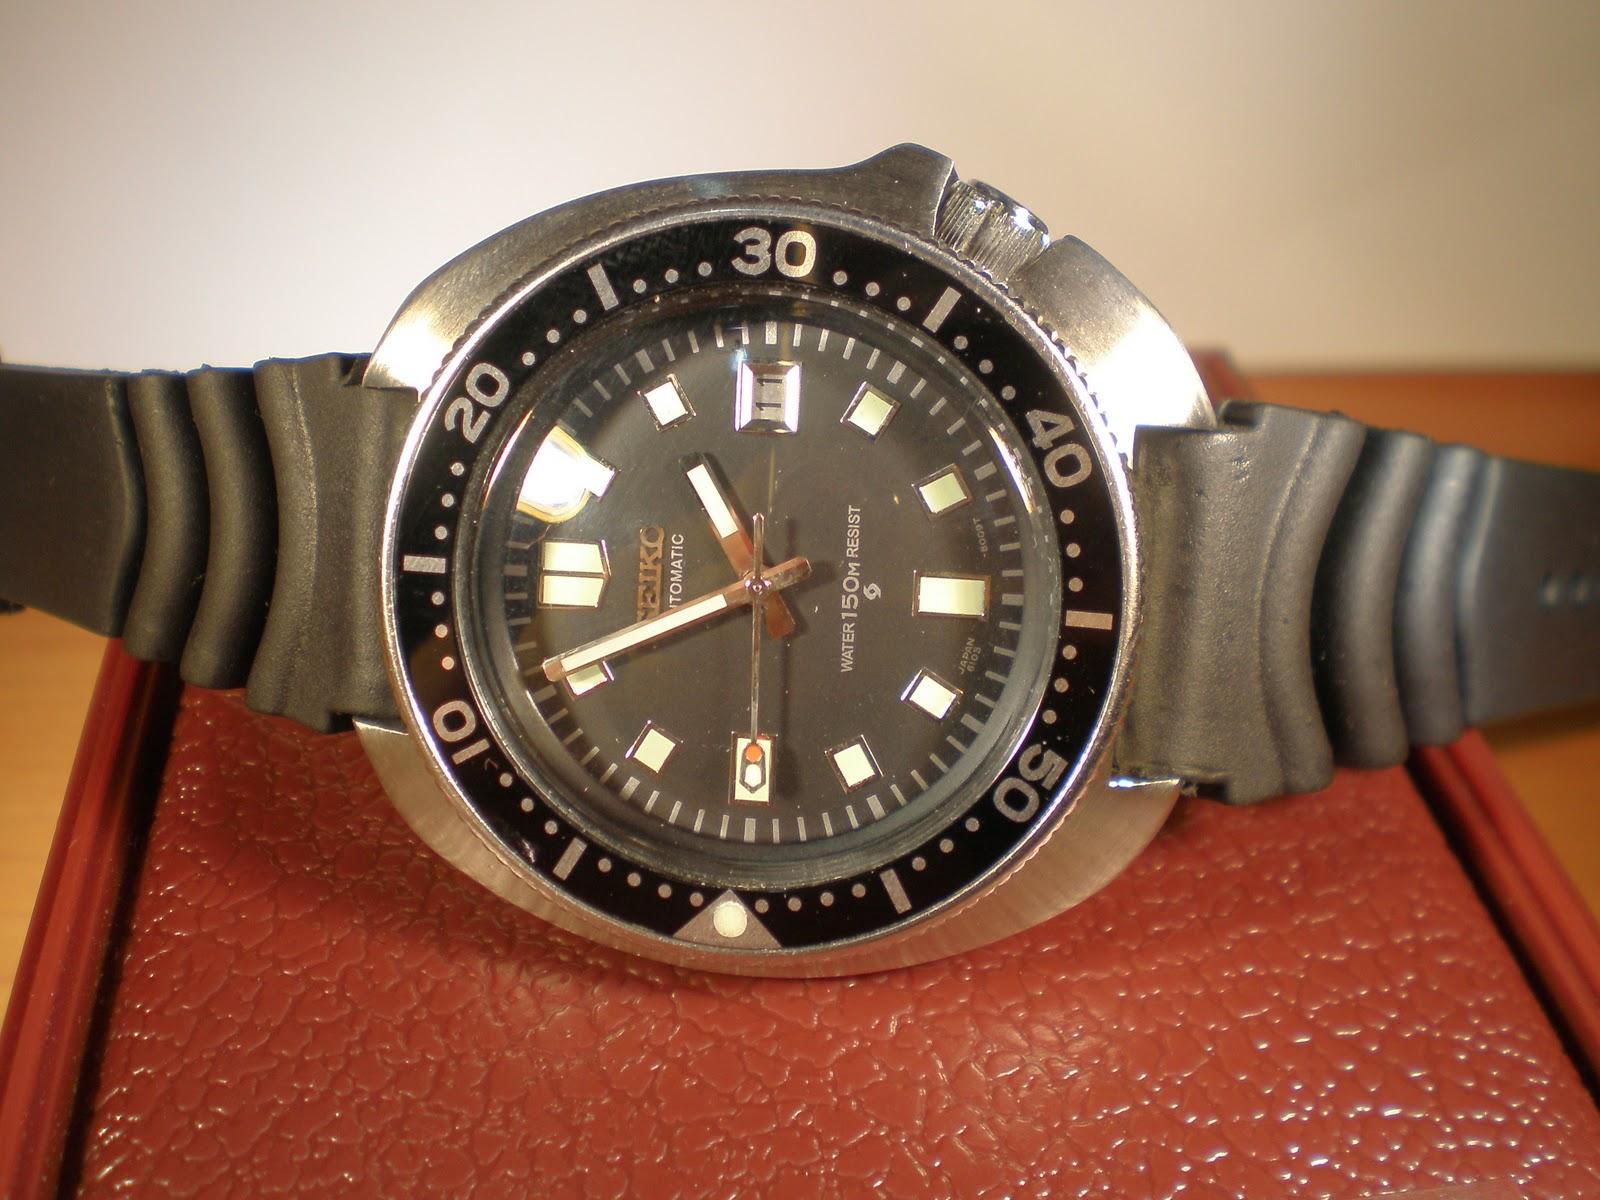 watchopenia: Seiko diver 6105-8009